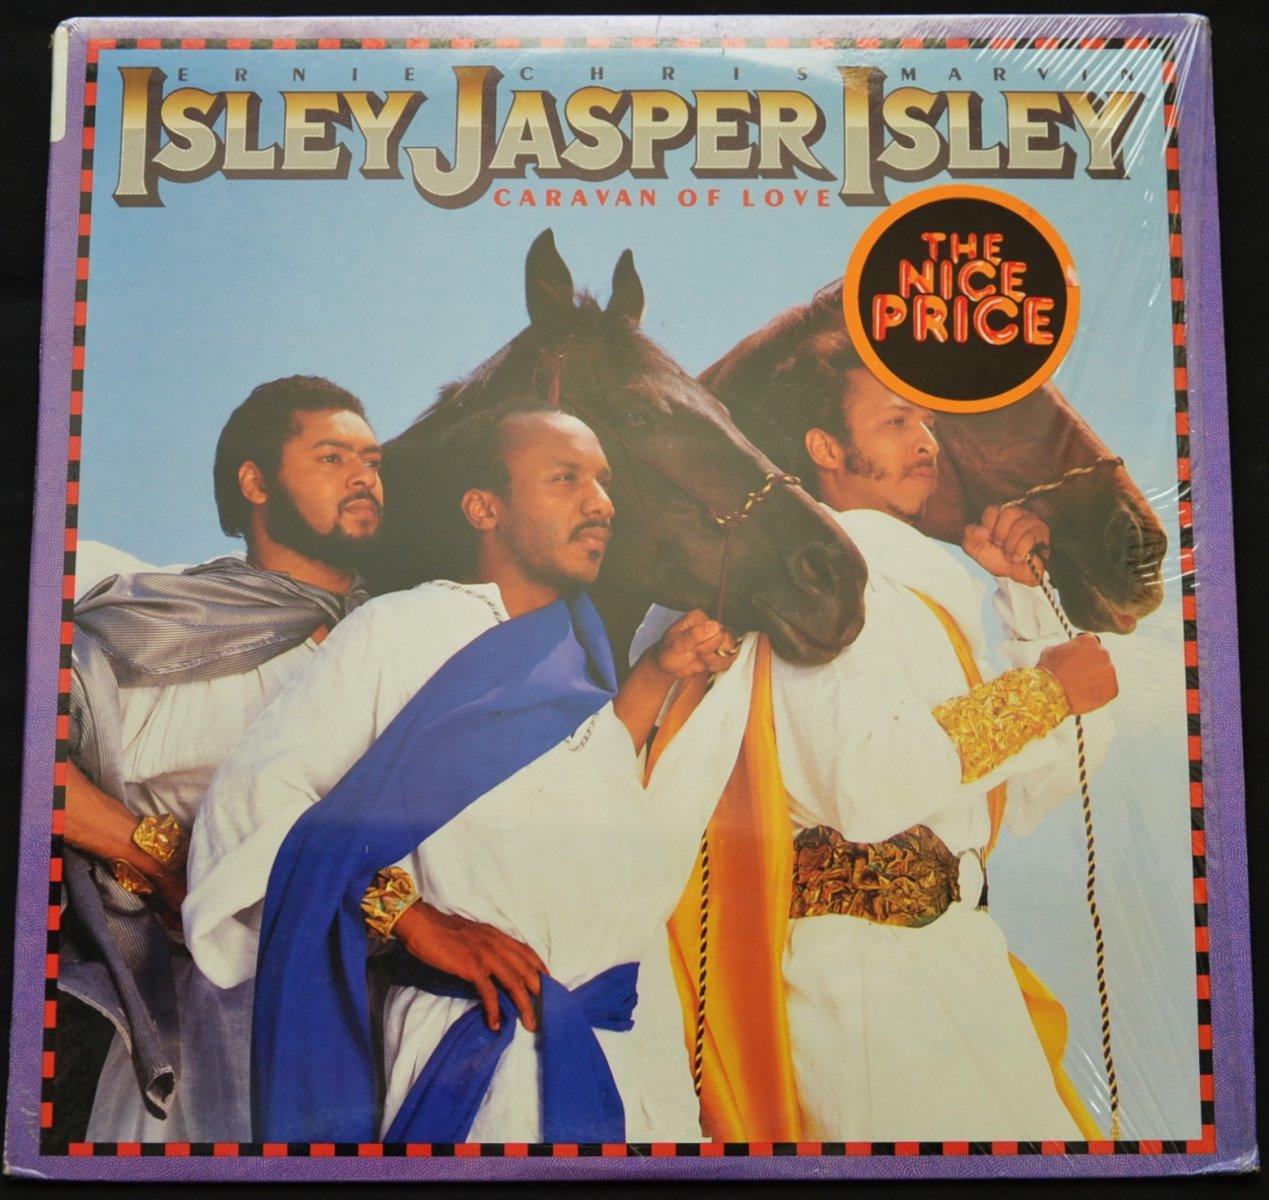 ISLEY JASPER ISLEY / CARAVAN OF LOVE (LP)